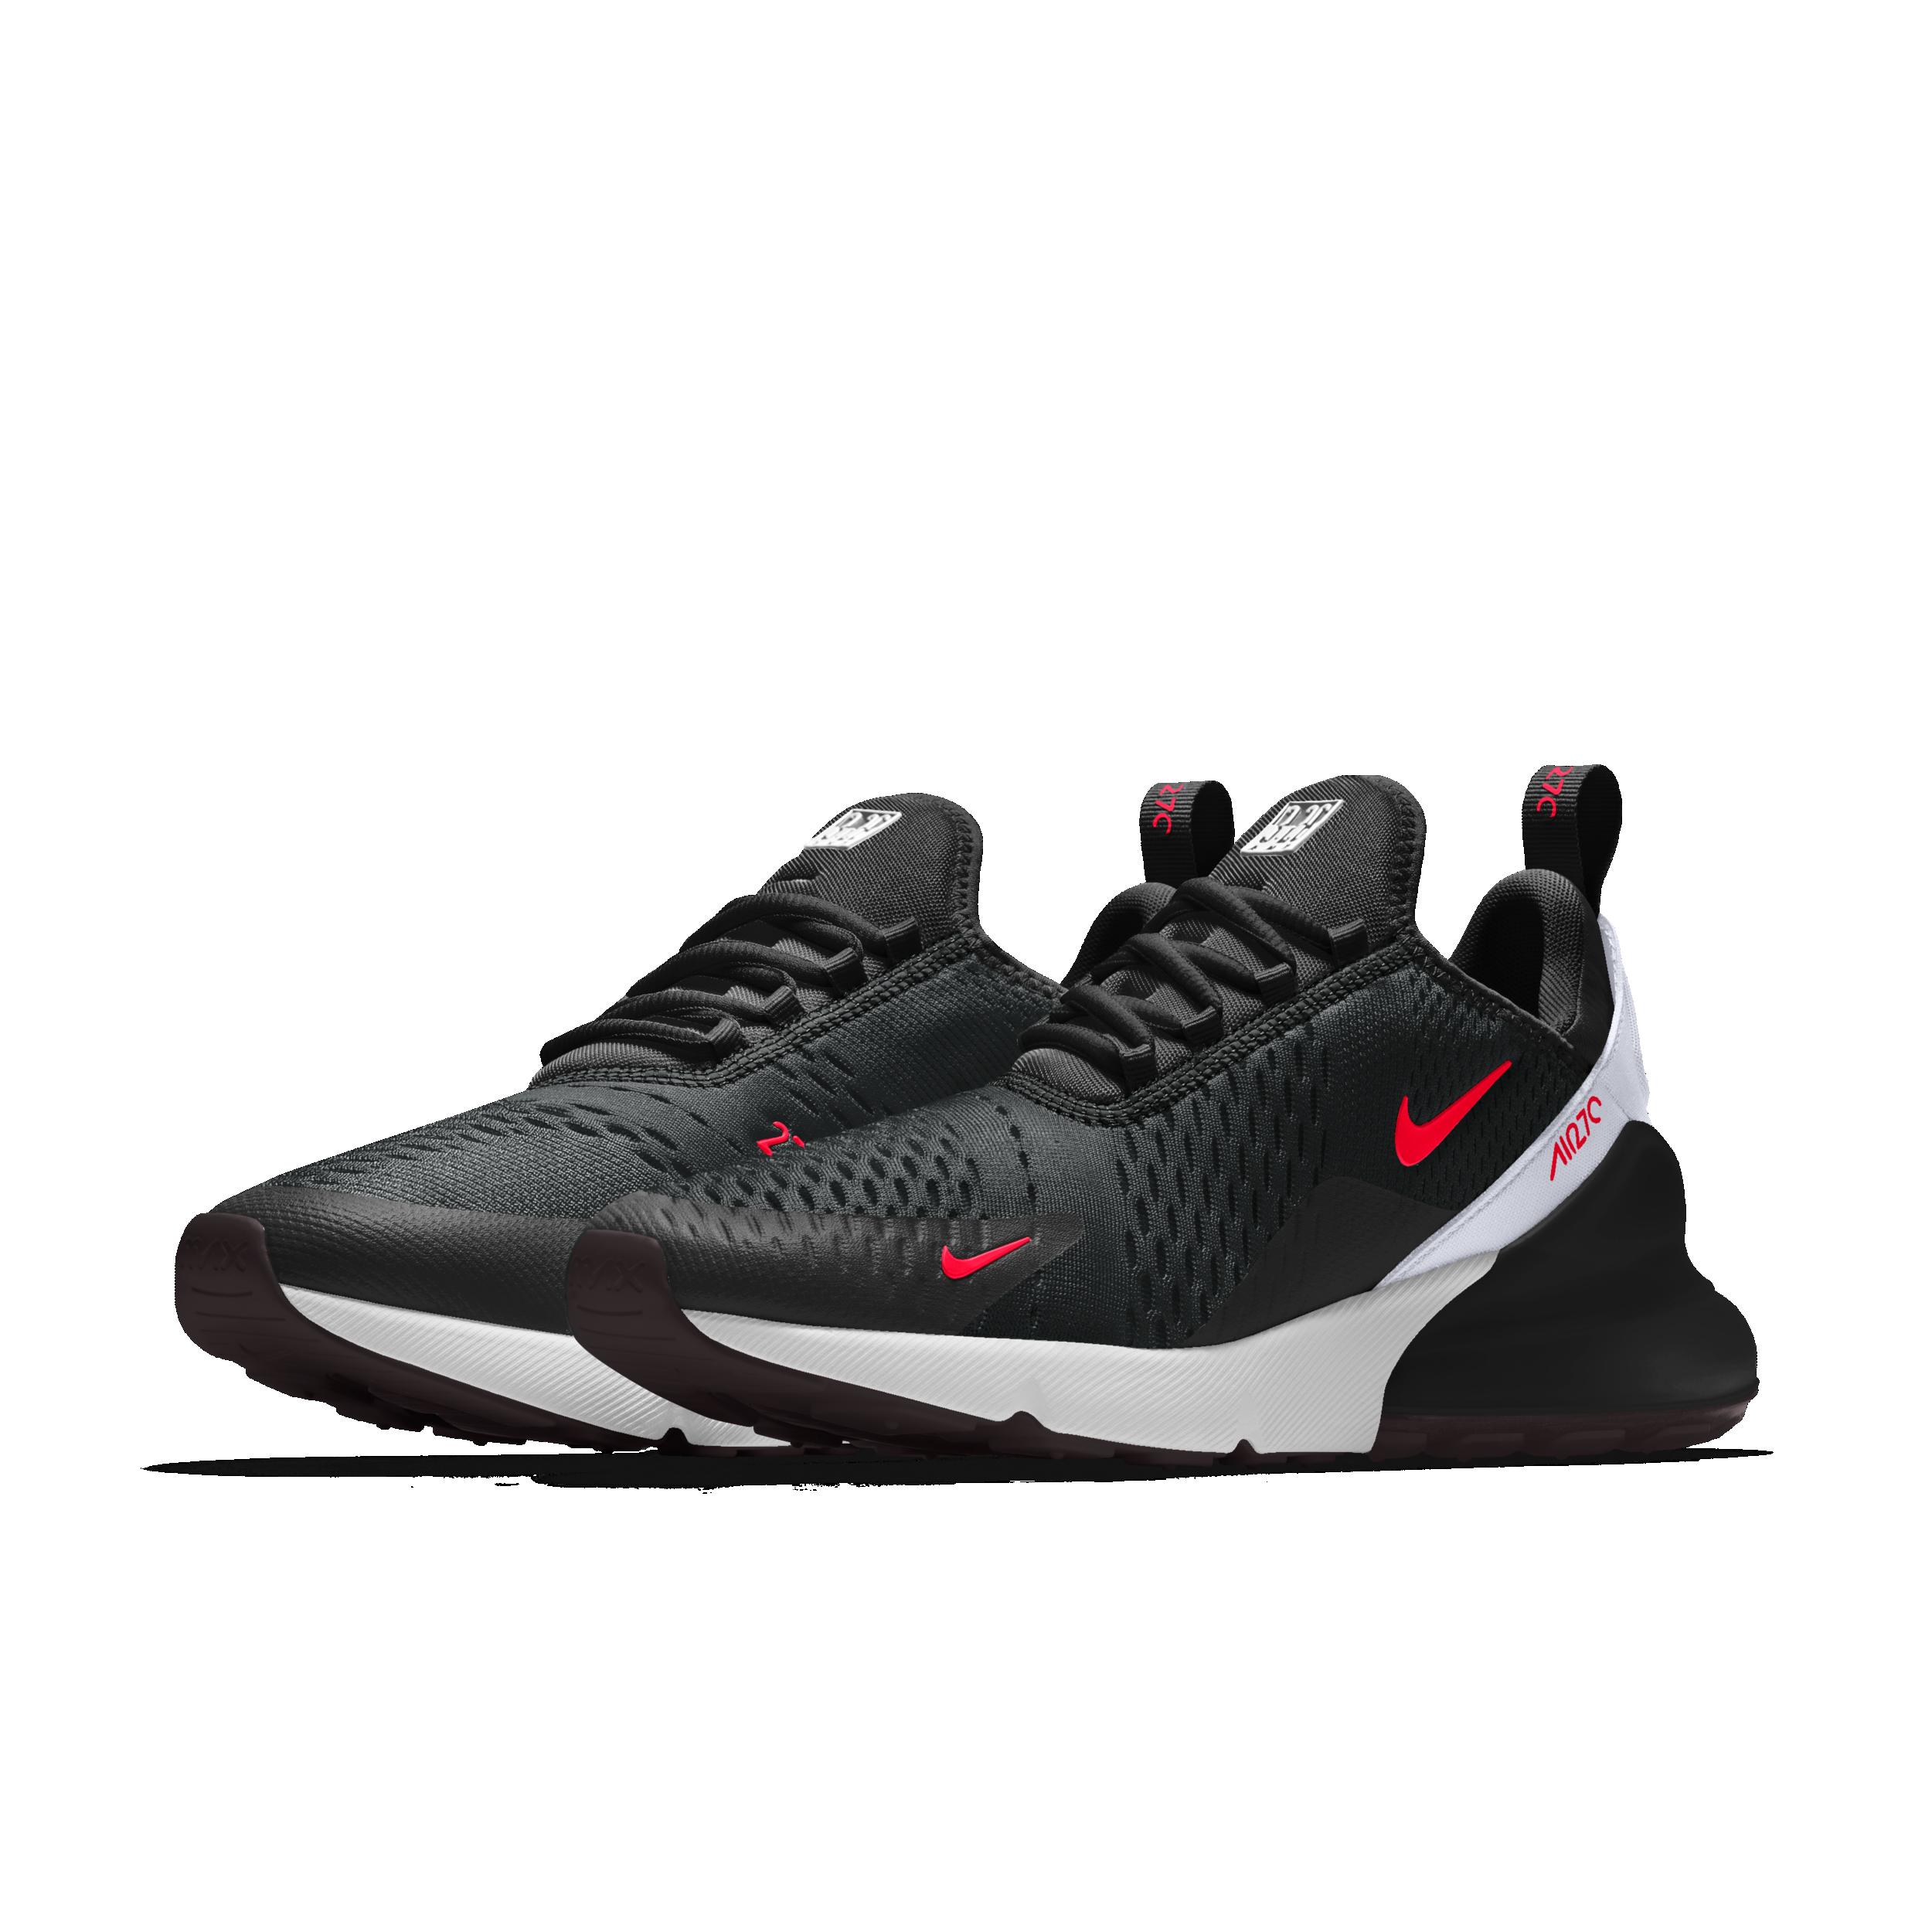 Nike Air Max 270 Id Schuh Nike Com De Nike Free Shoes Nike Shoes Nike Air Max